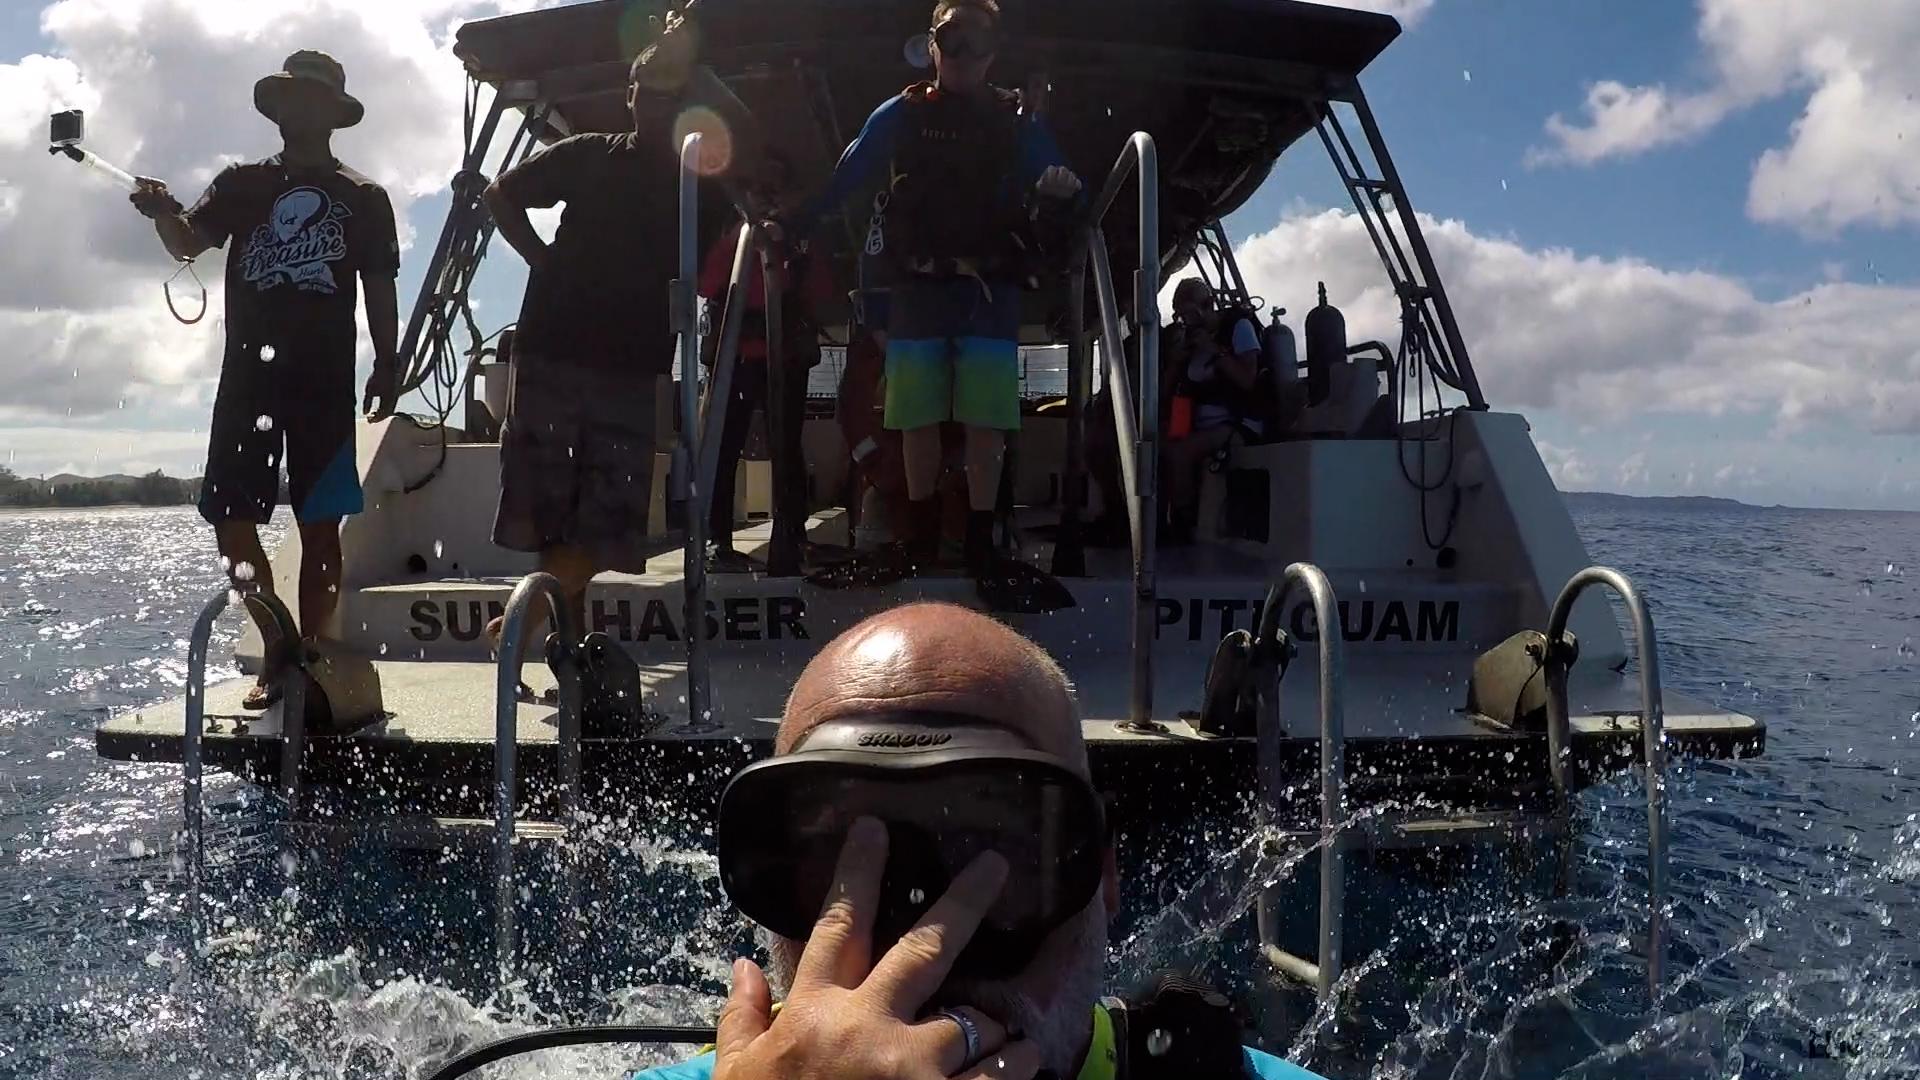 Selfie with Boat Crew